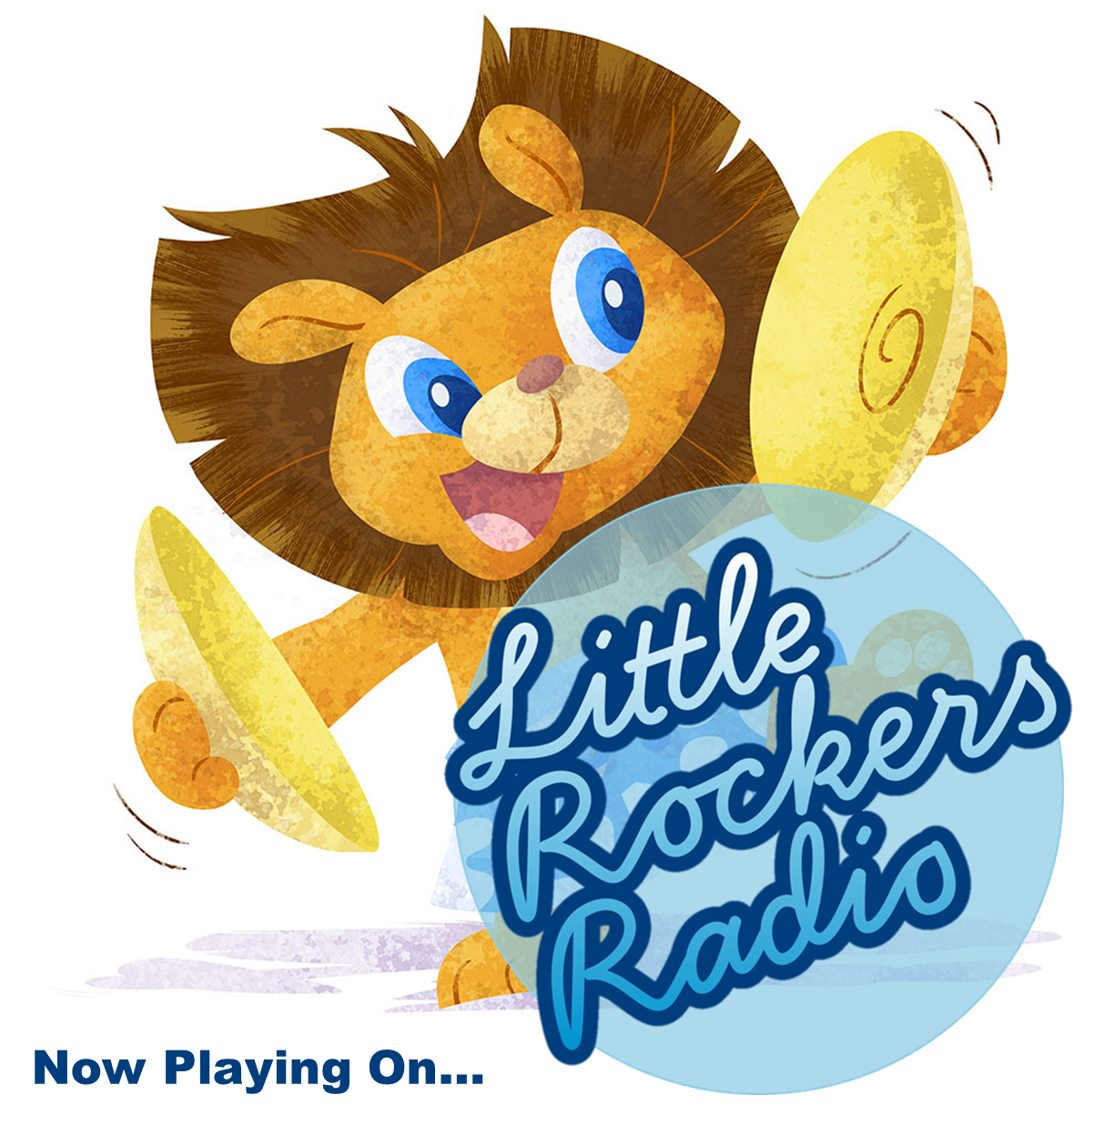 Larrikin Puppets Added to Little Rockers Radio Rotation